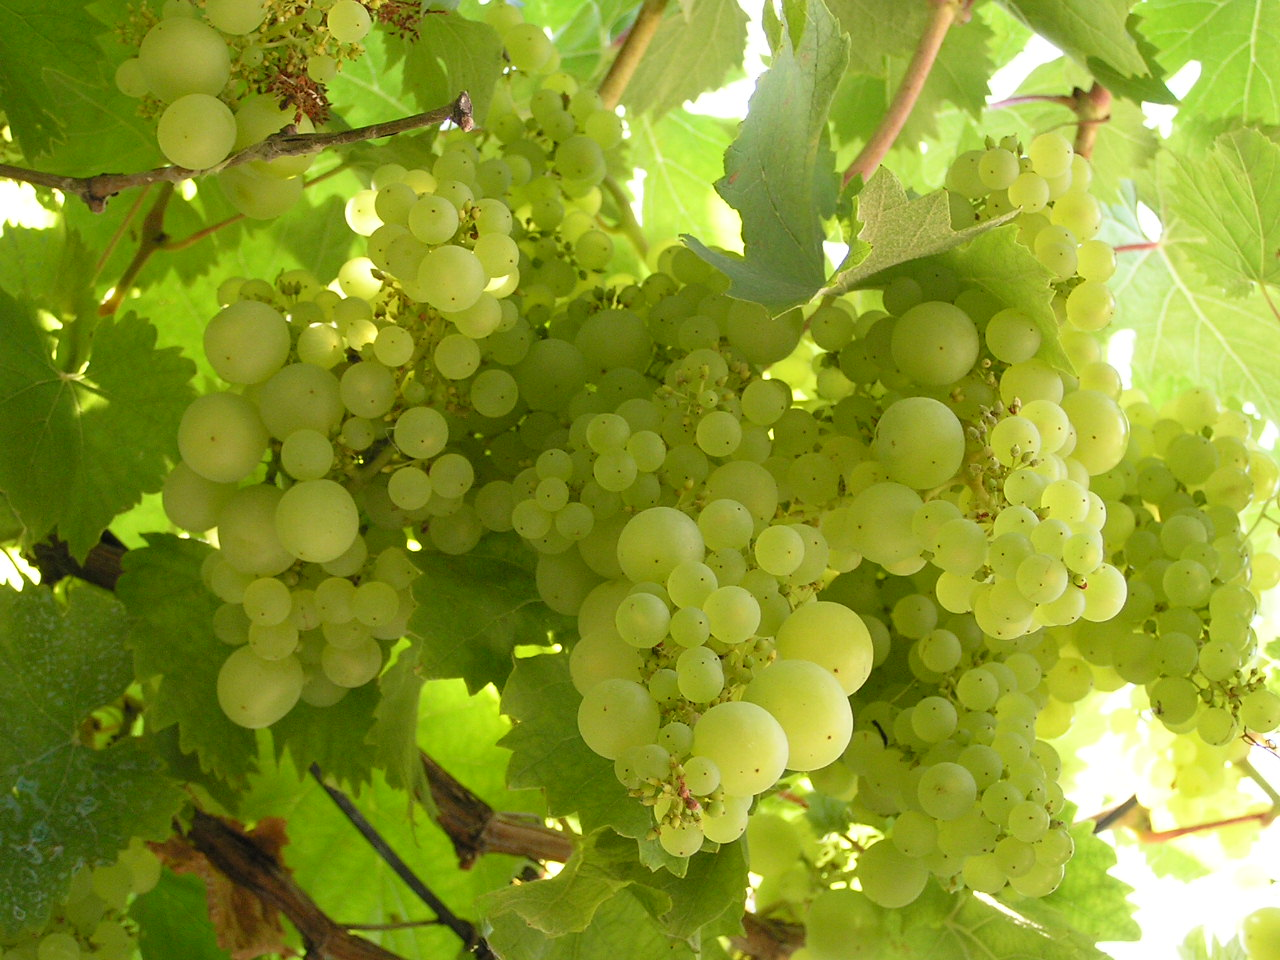 Sun shining through grapevines